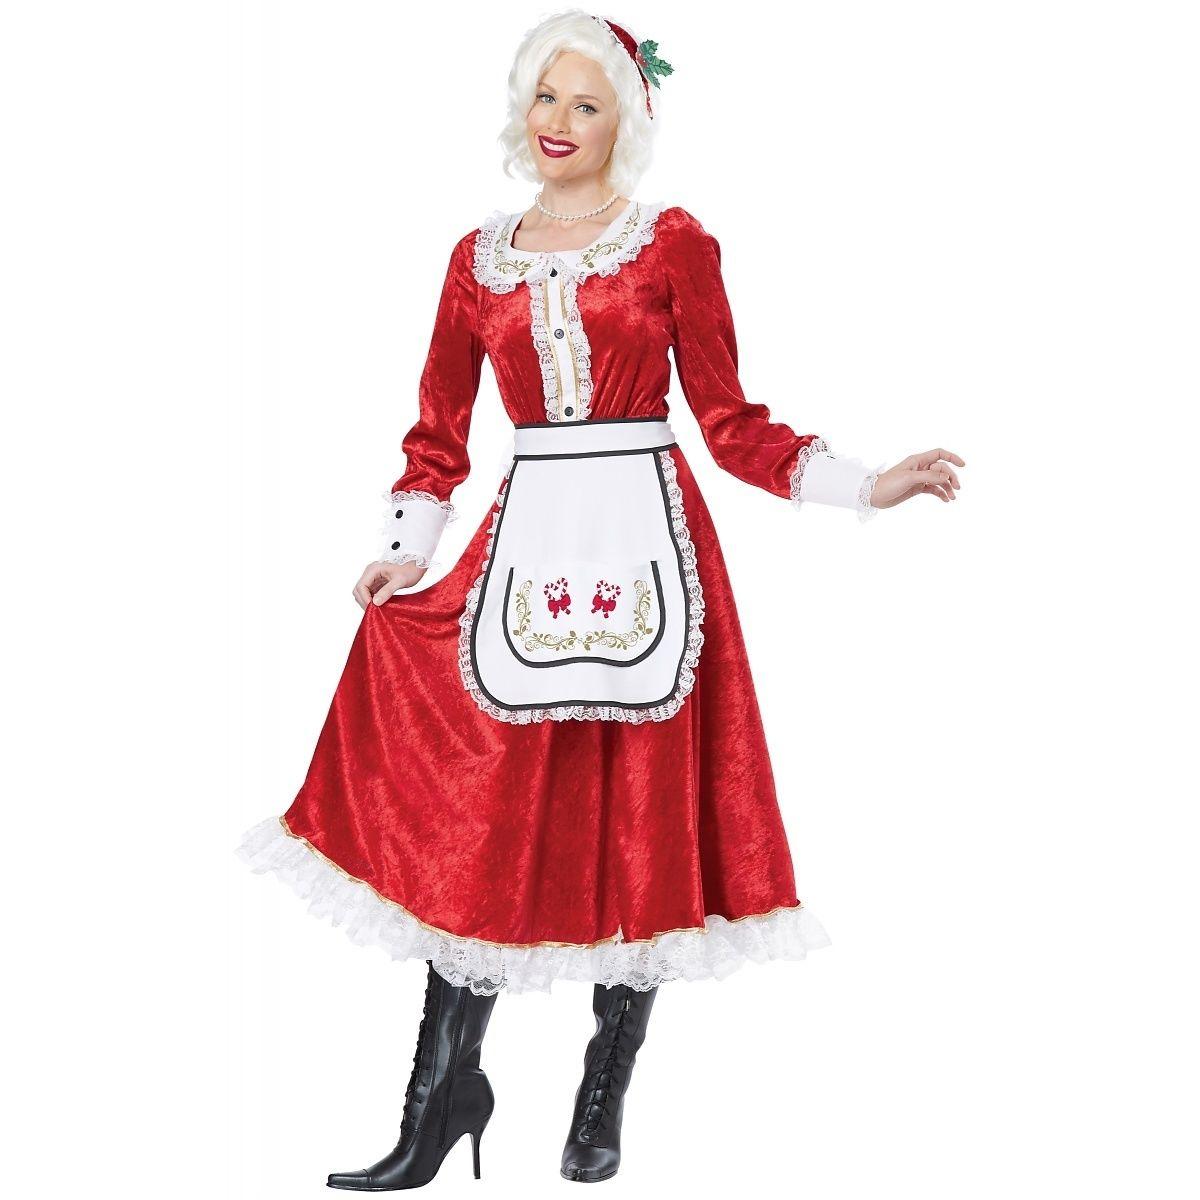 5dbc8f2539f99 Classic Mrs. Claus Adult Costume Fancy Dress Red Christmas Santa ...